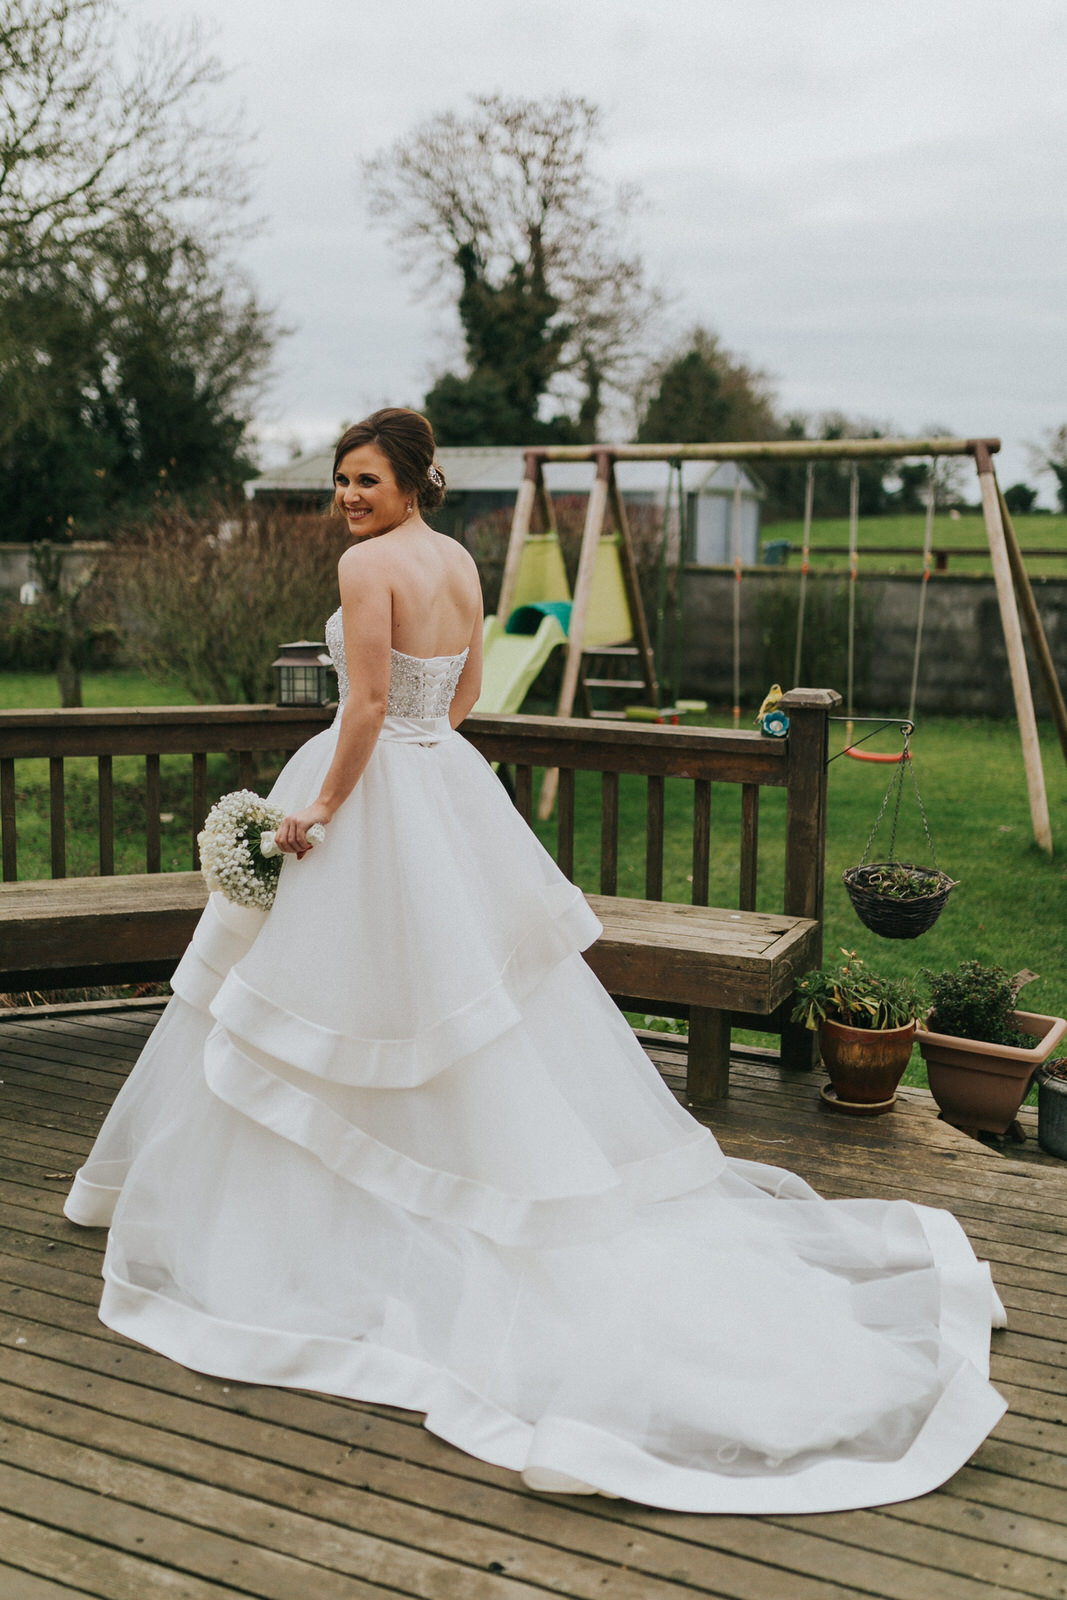 Clonabreany_wedding-photographer_roger_kenny_ireland_037.jpg